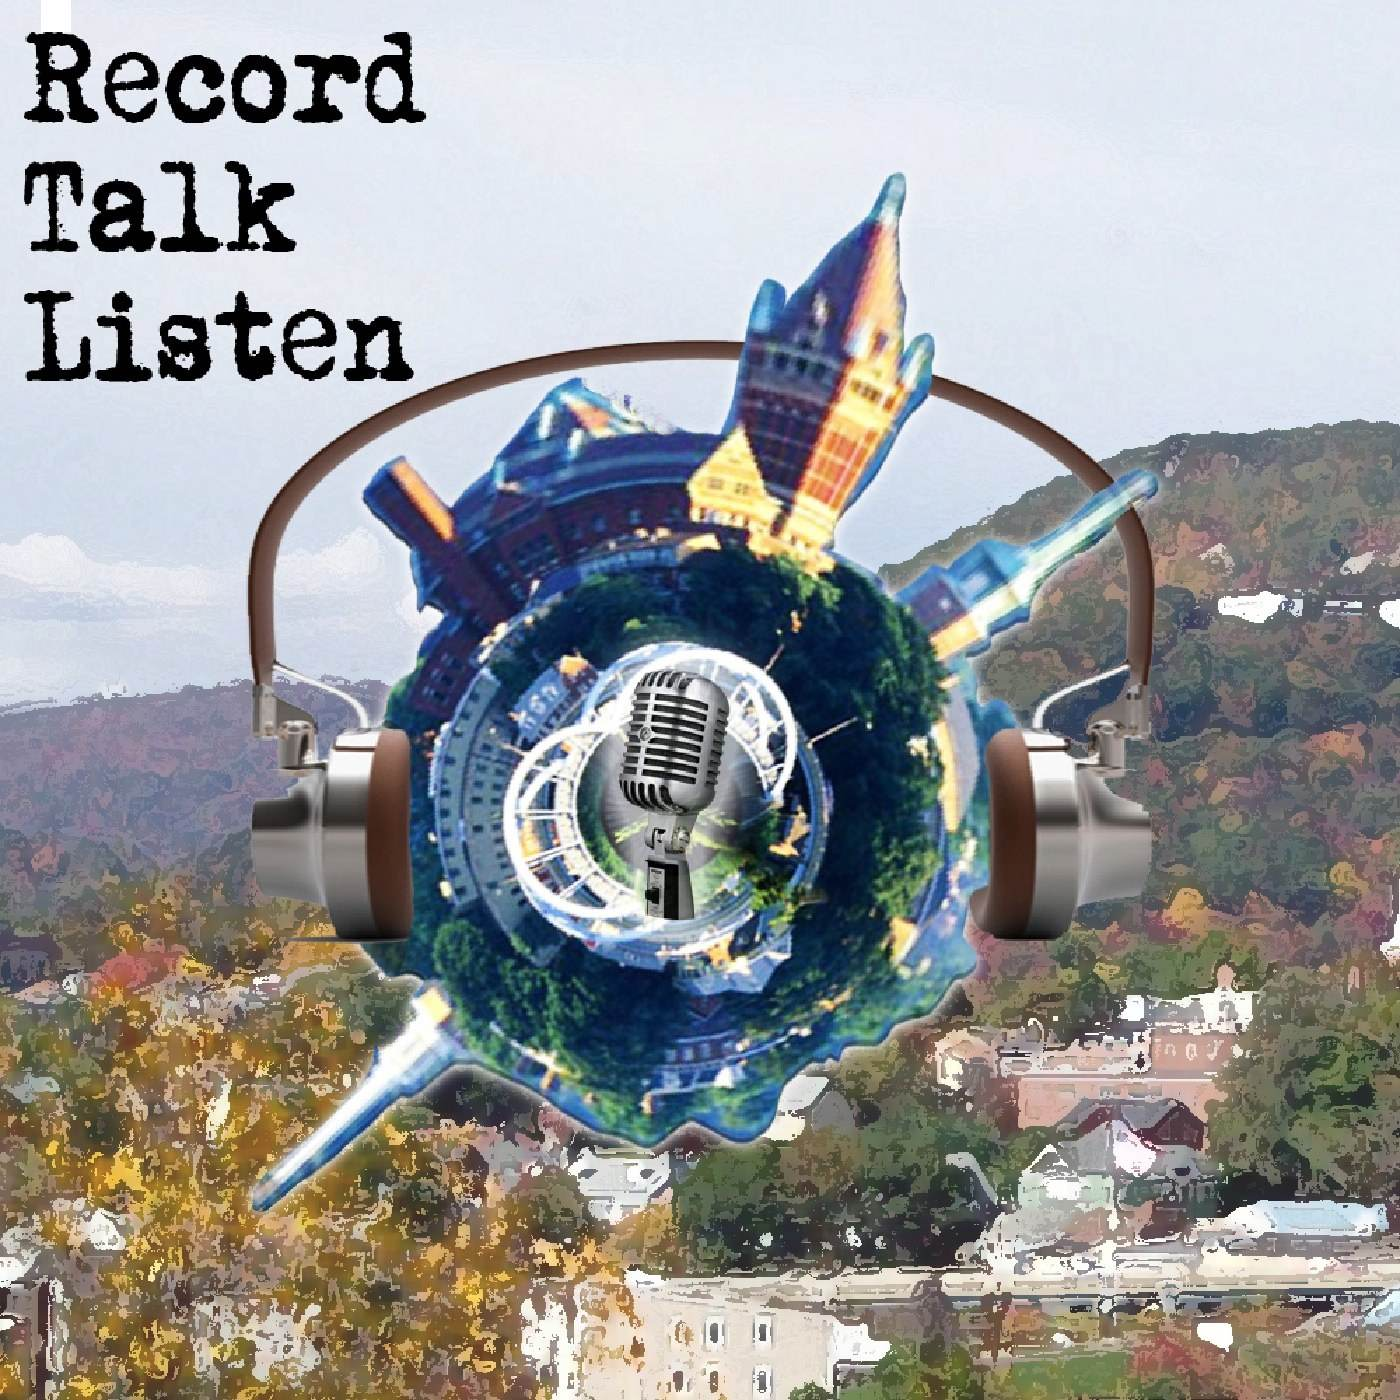 Record Talk Listen